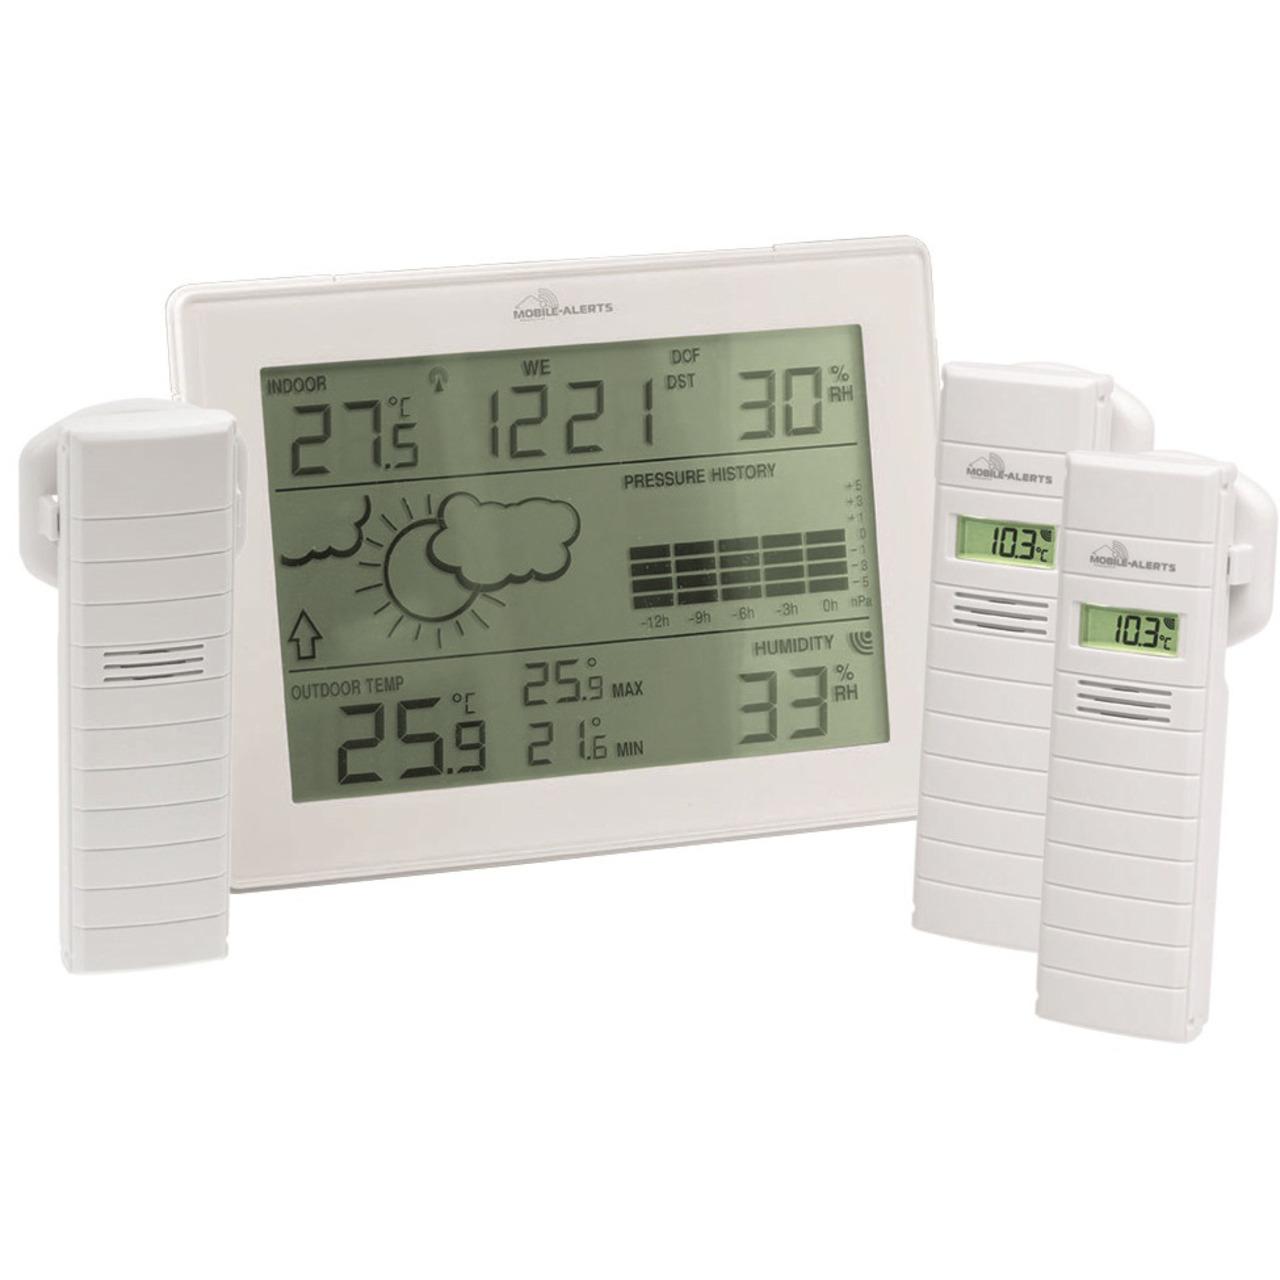 ELV Mobile Alerts Zusatzsensoren-Spar-Set: Wetterstation MA10410- inkl. 3x Thermo-/Hygrosensor